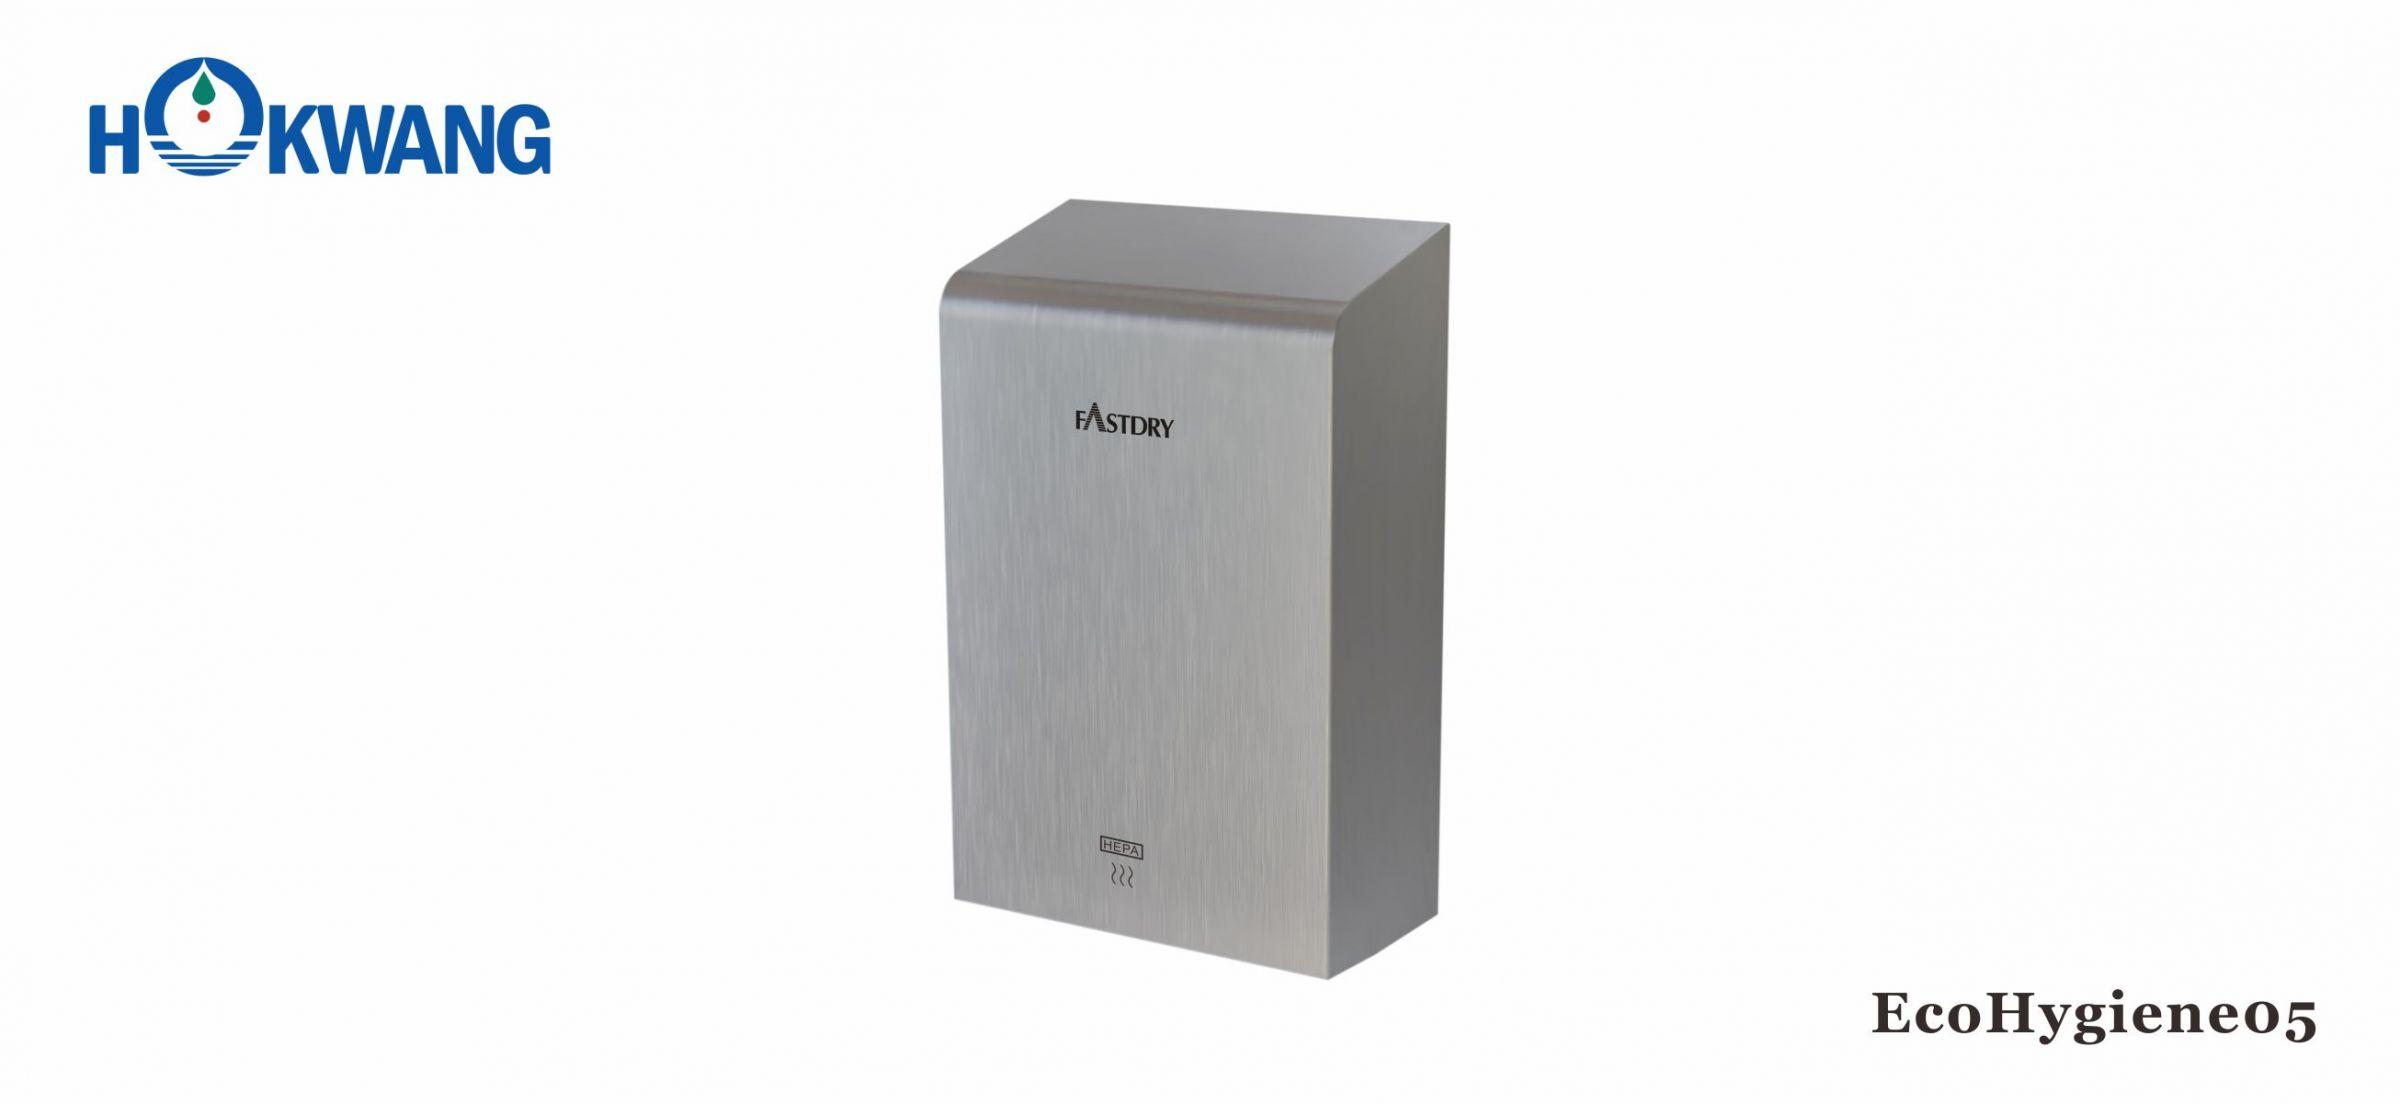 EcoHygiene05 ADA compliant Hygienic Satin Stainless Steel Hand Dryer